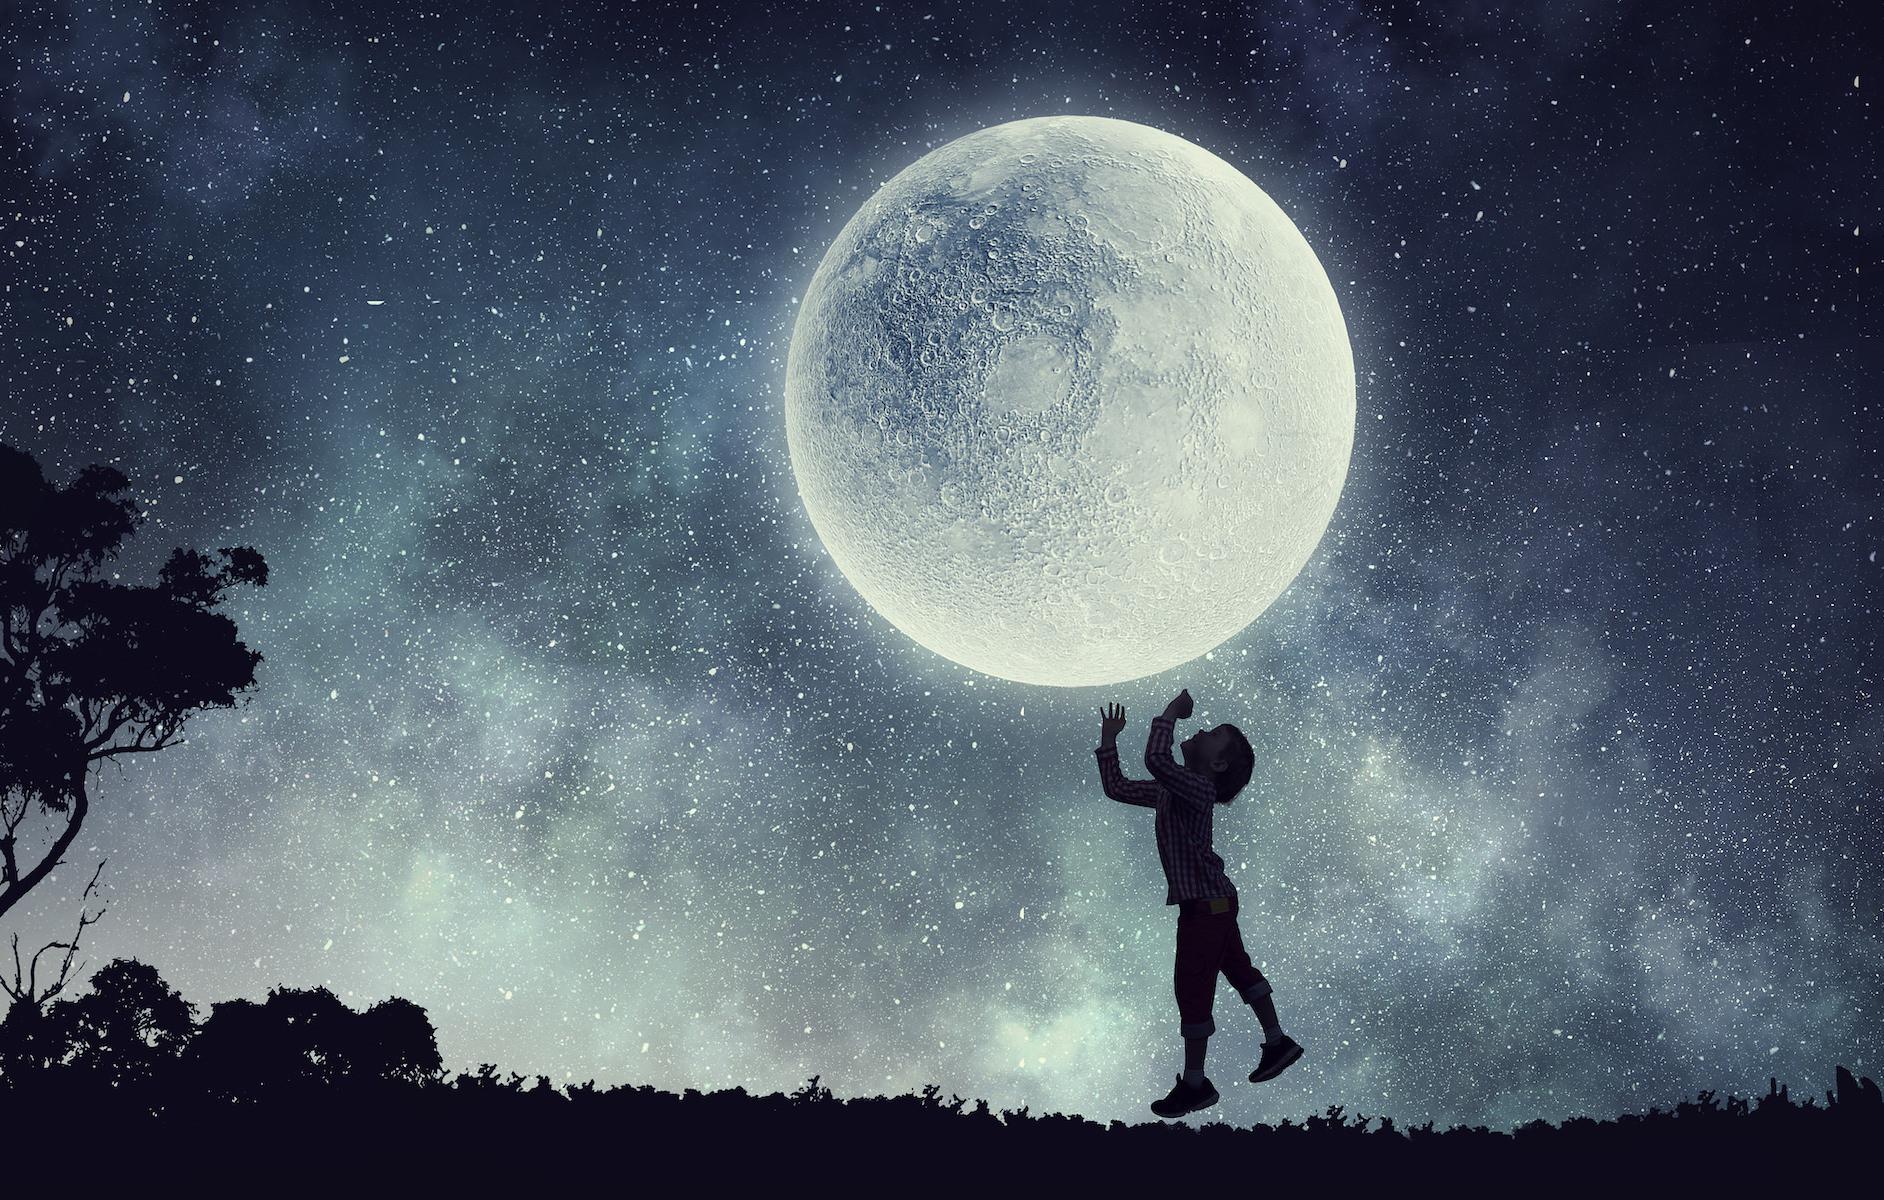 moon-child-alone